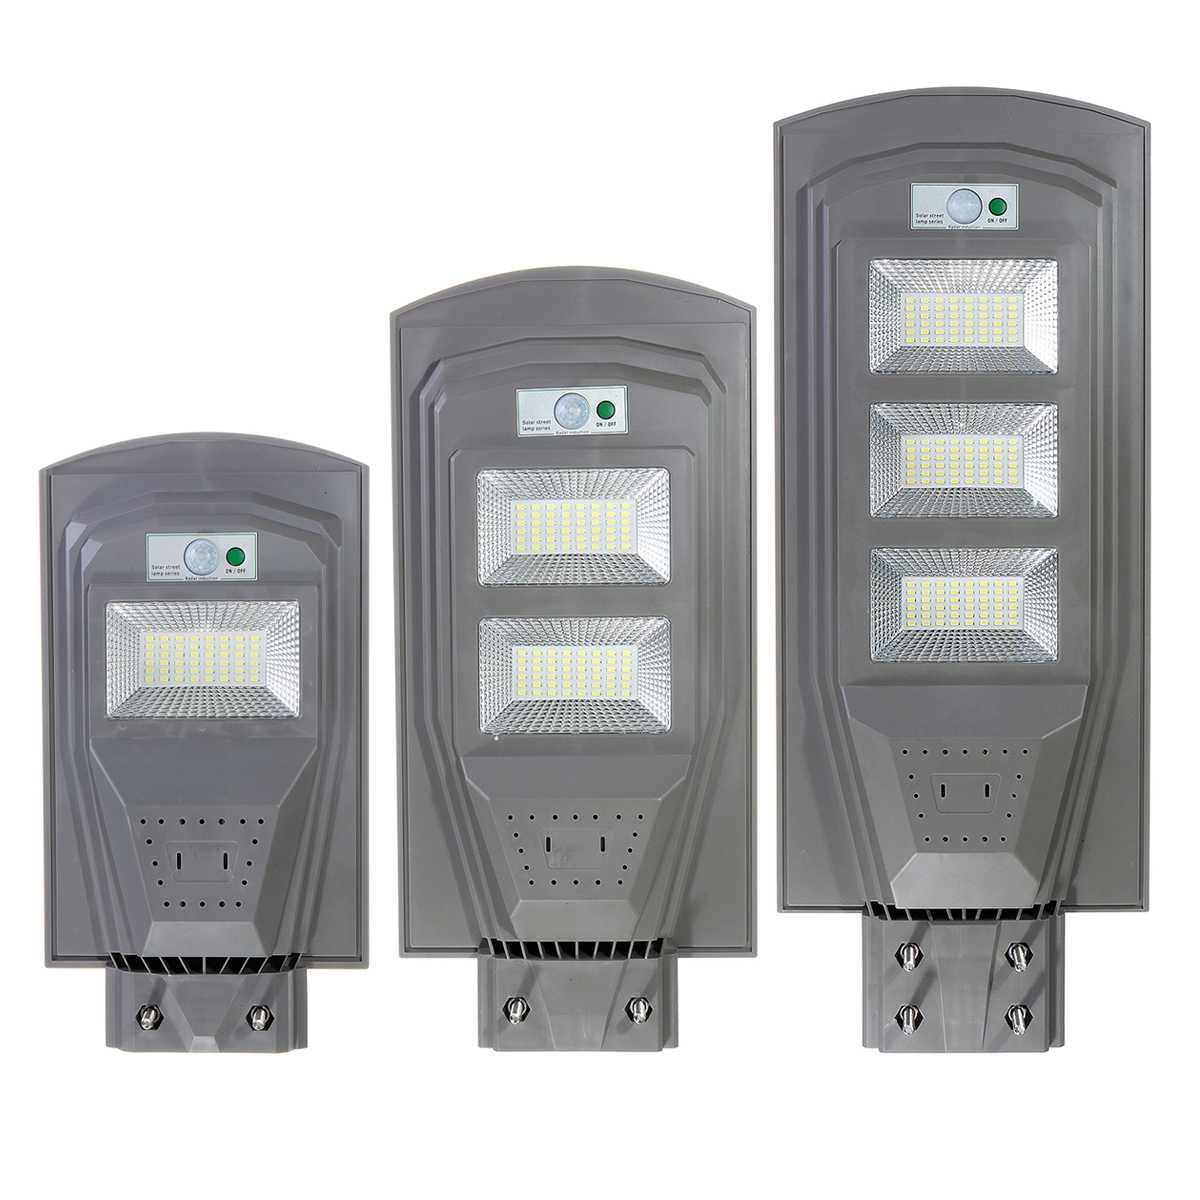 30W 60W 90W Solar Street Light Outdoor Lighting LED Solar Powered Lamp Grey Light Control+Human Body Induction